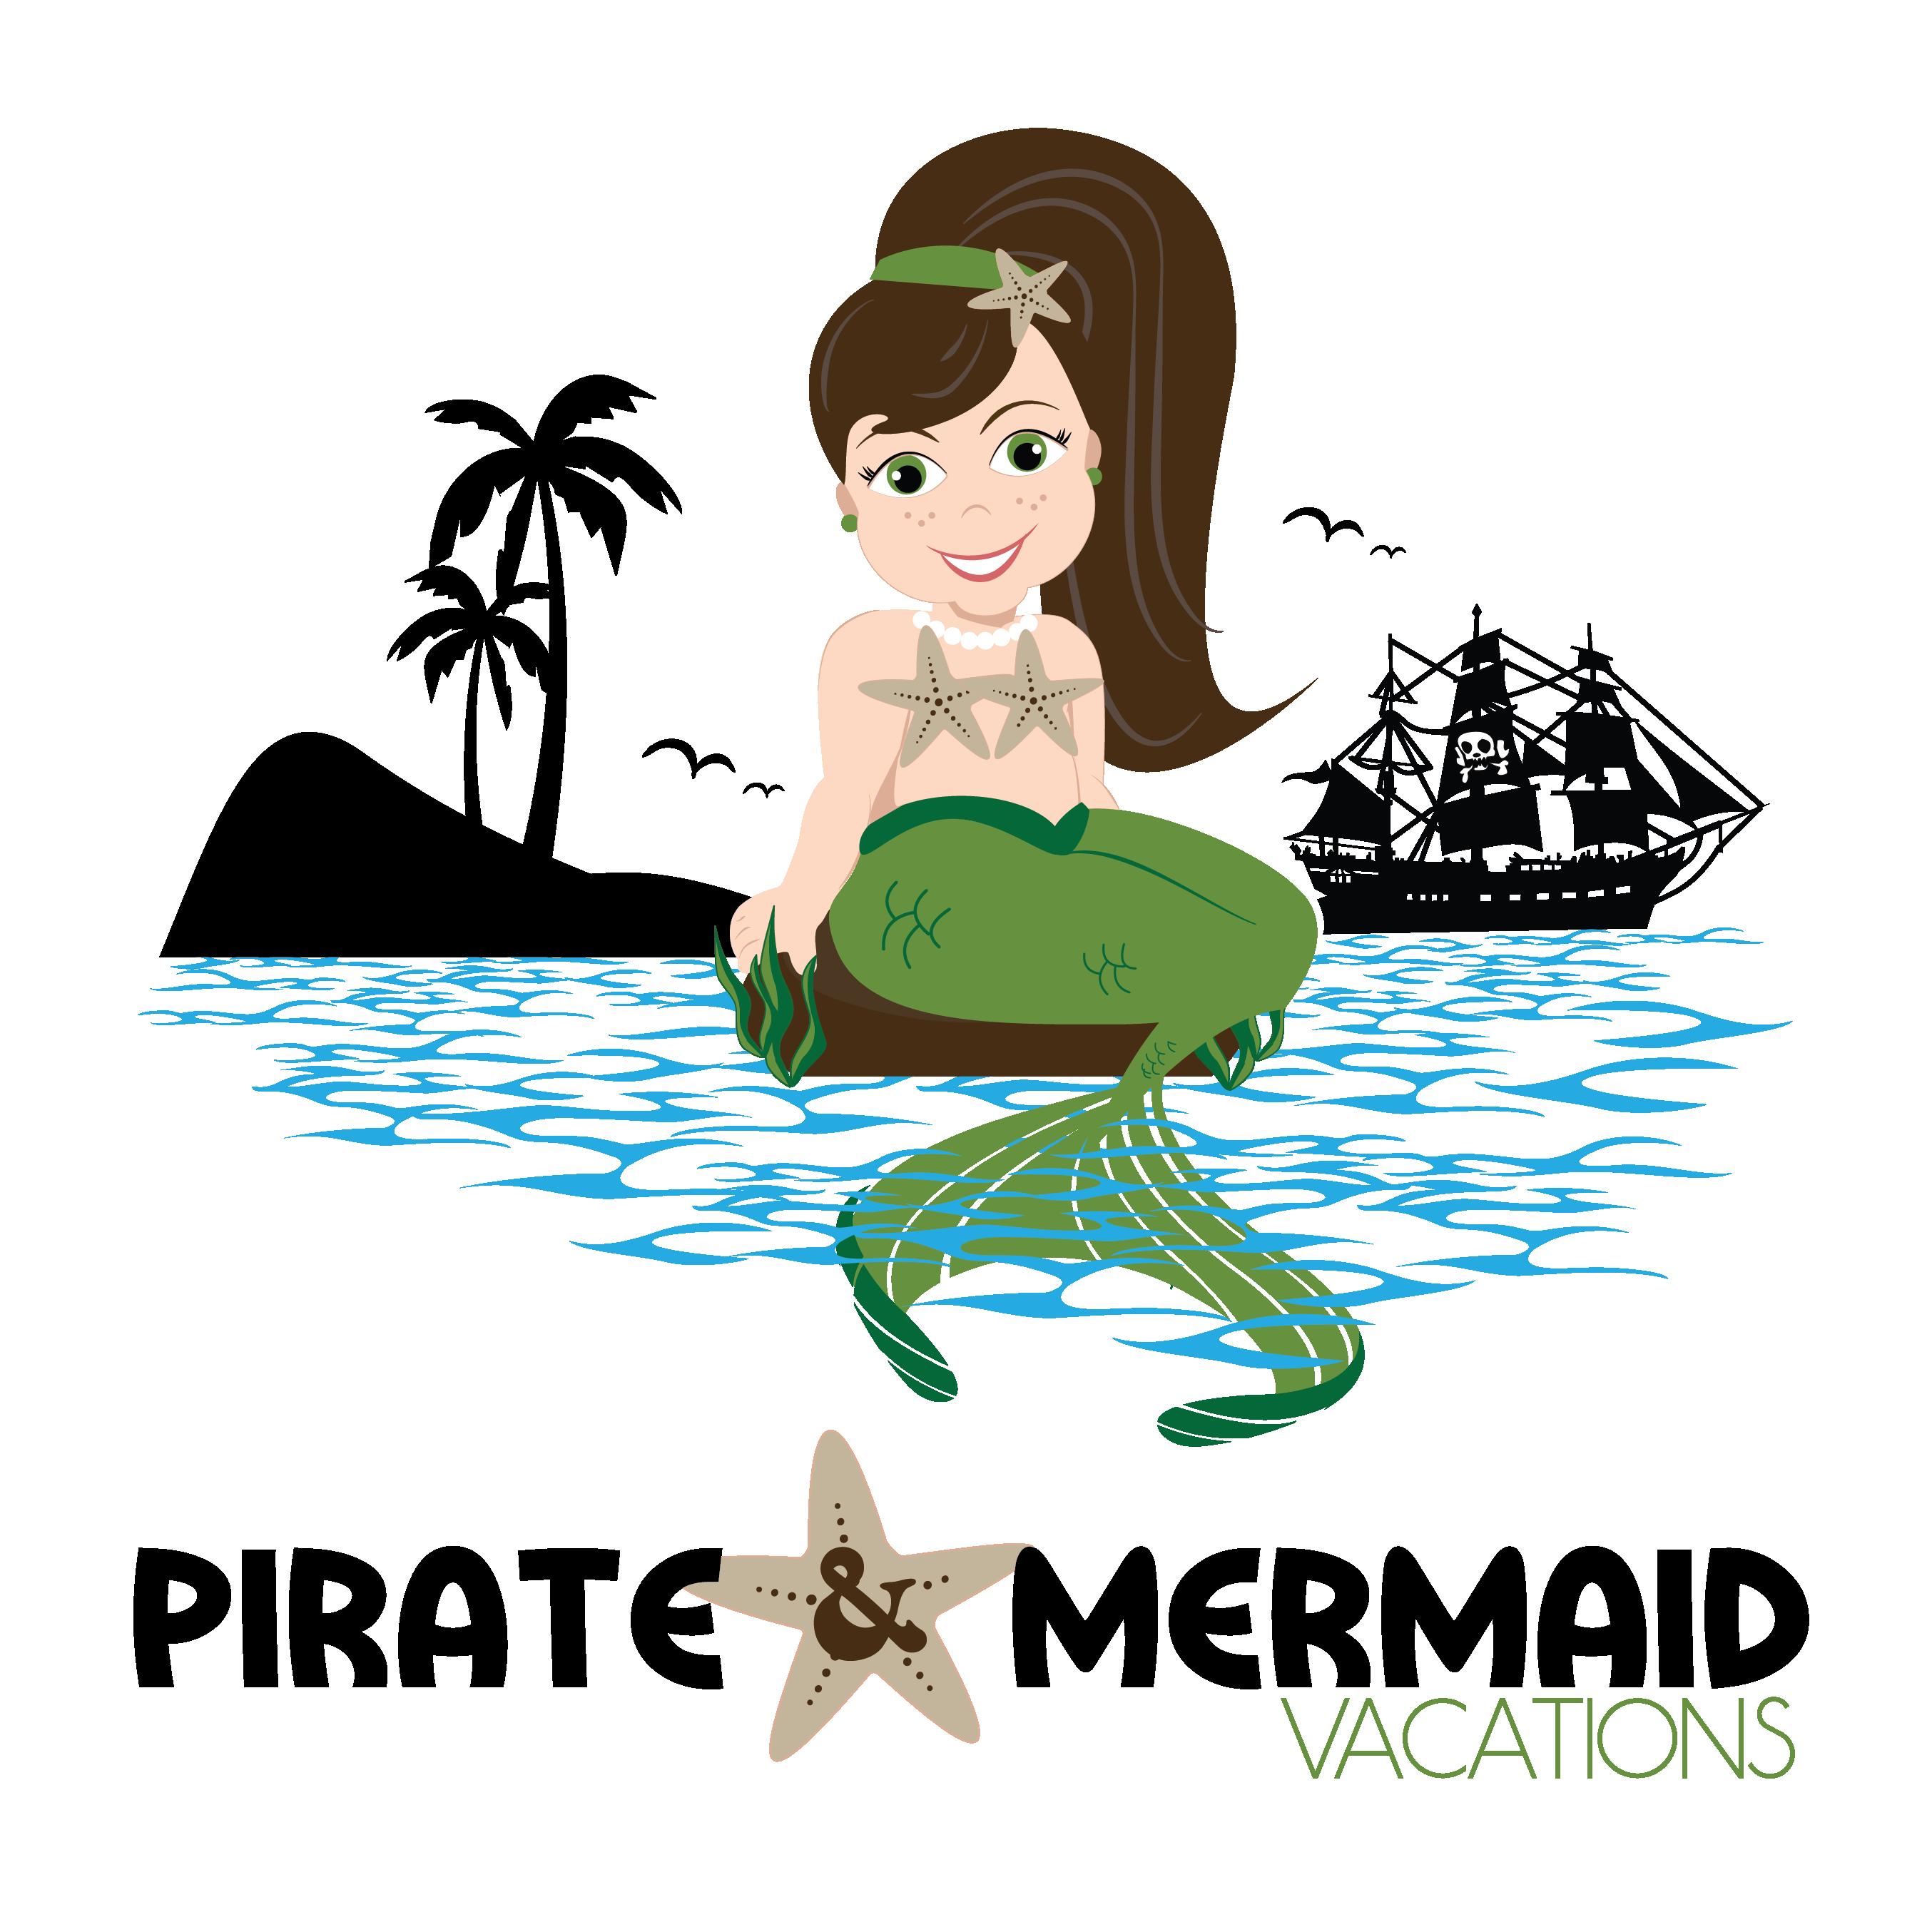 Pirates clipart princess. Homepage pirate and mermaid